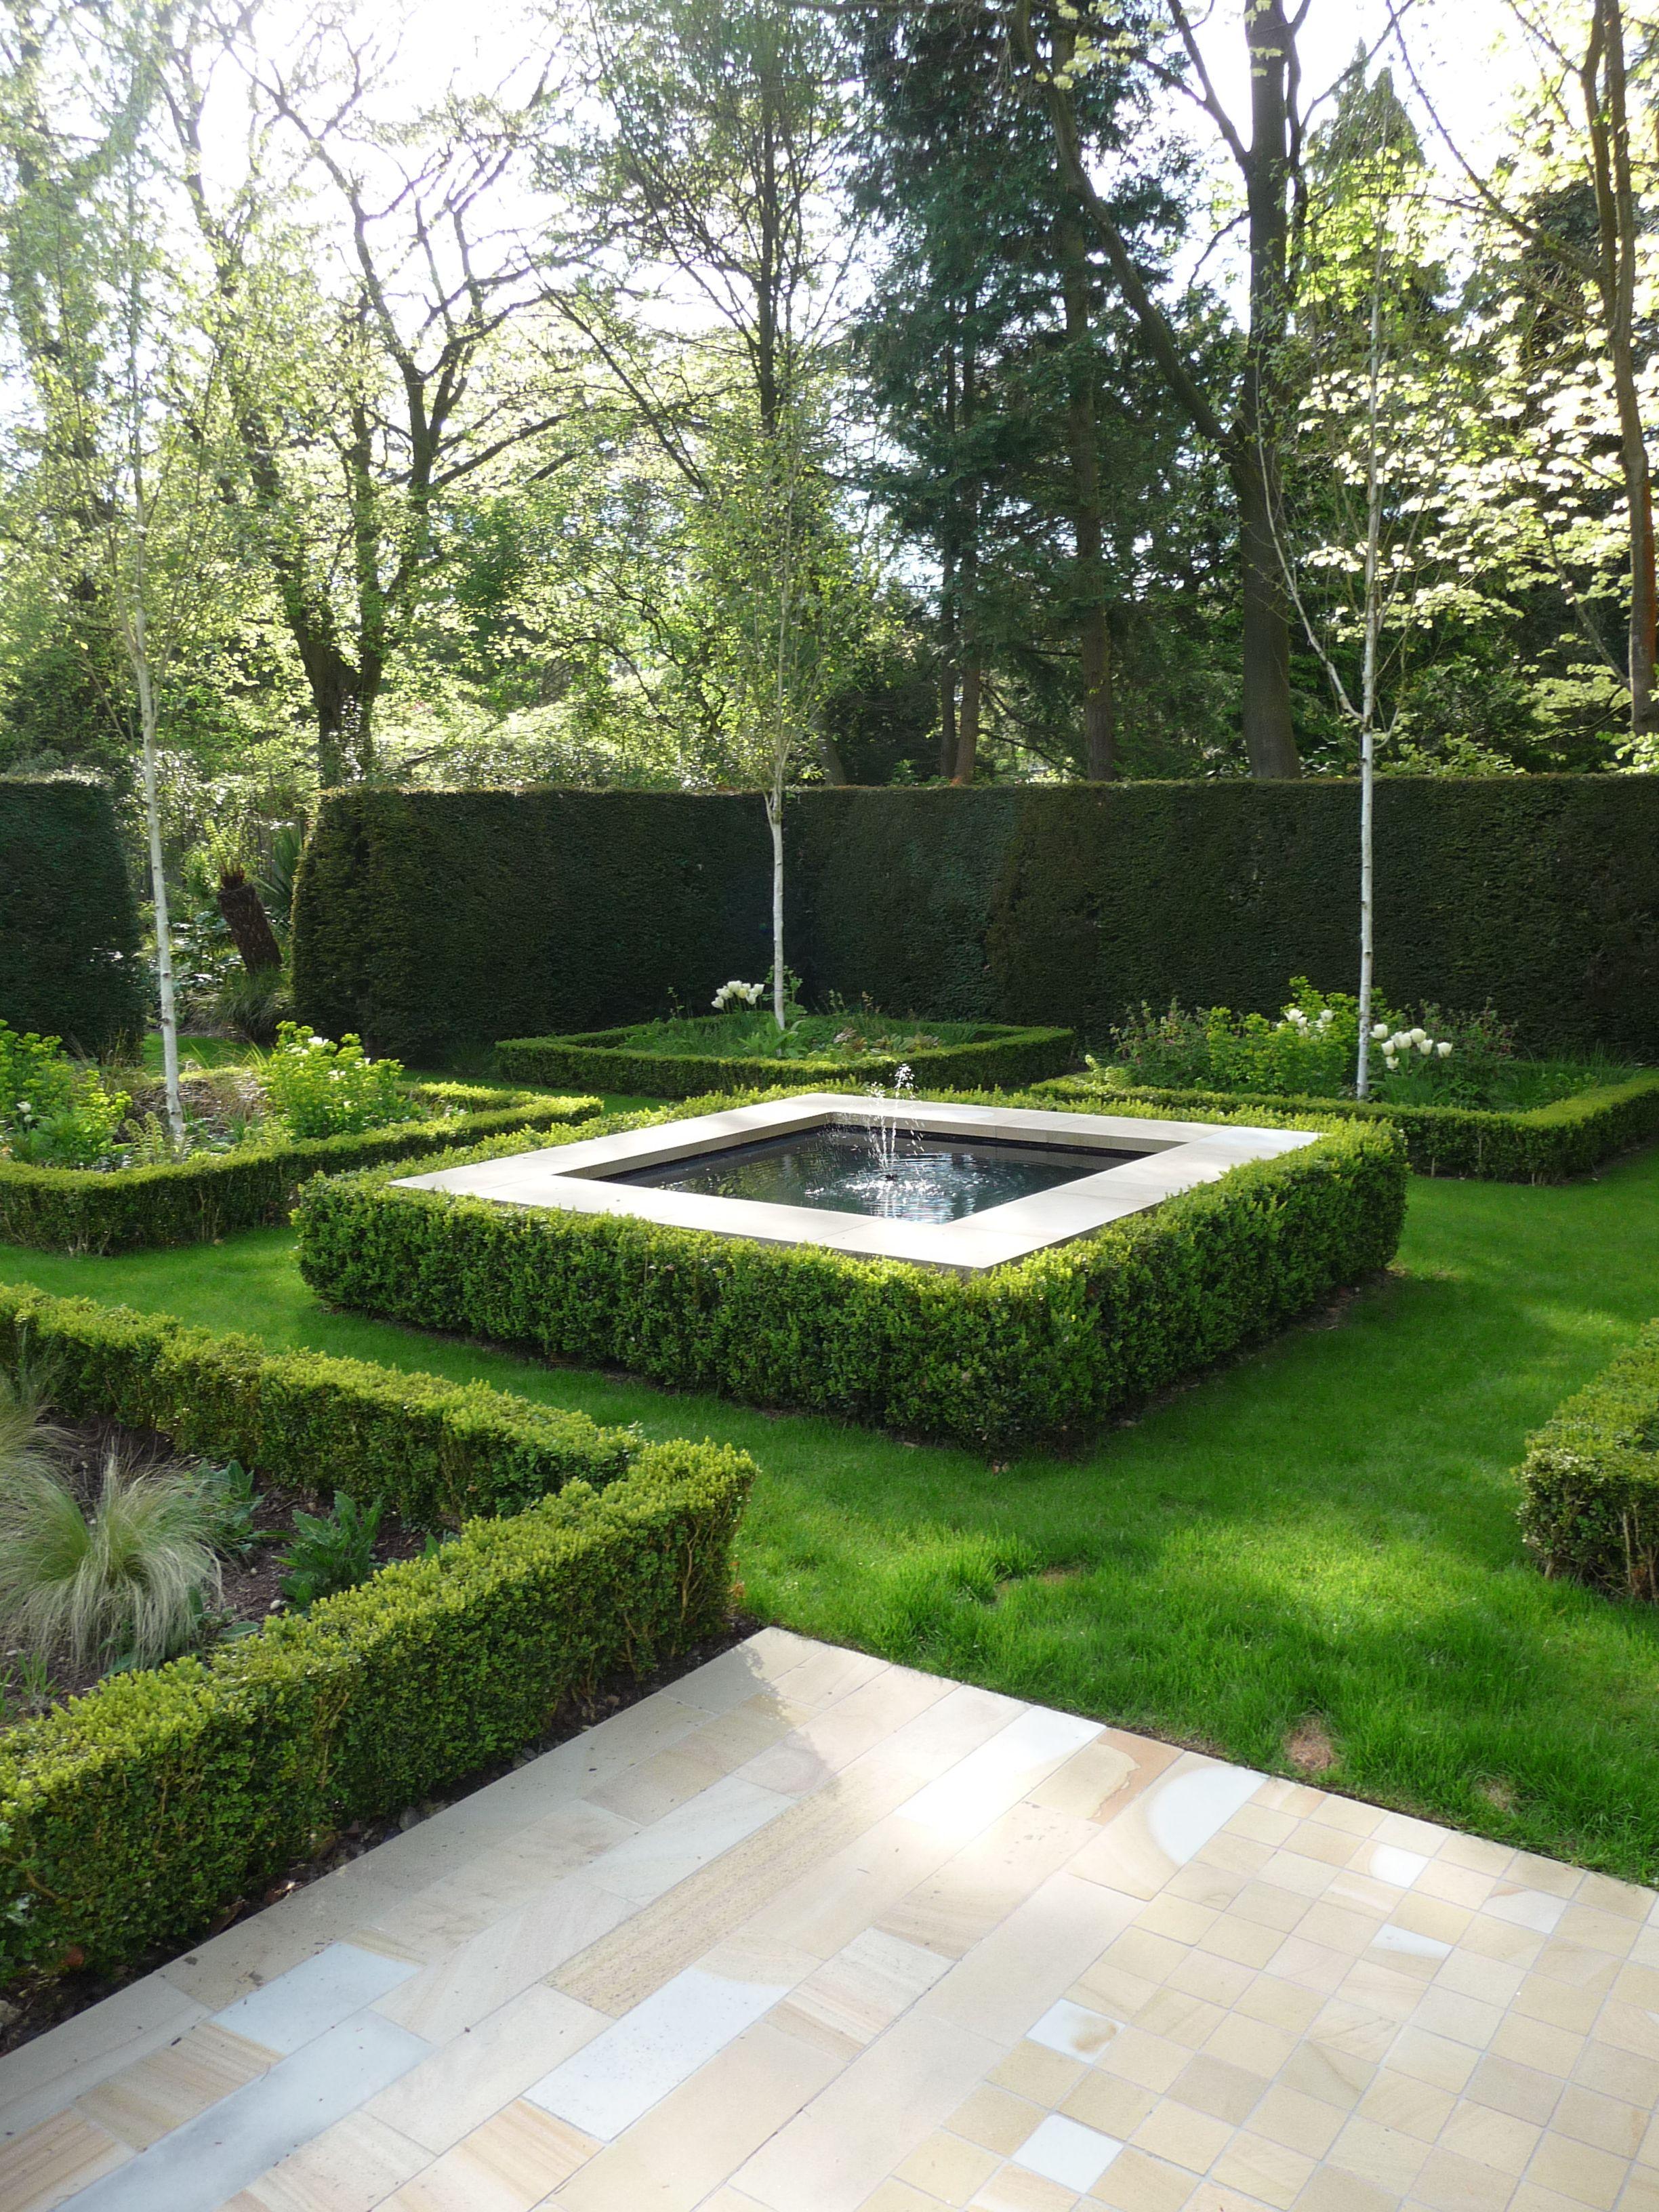 1000 images about zwem vijvers on pinterest water for Garden design uk